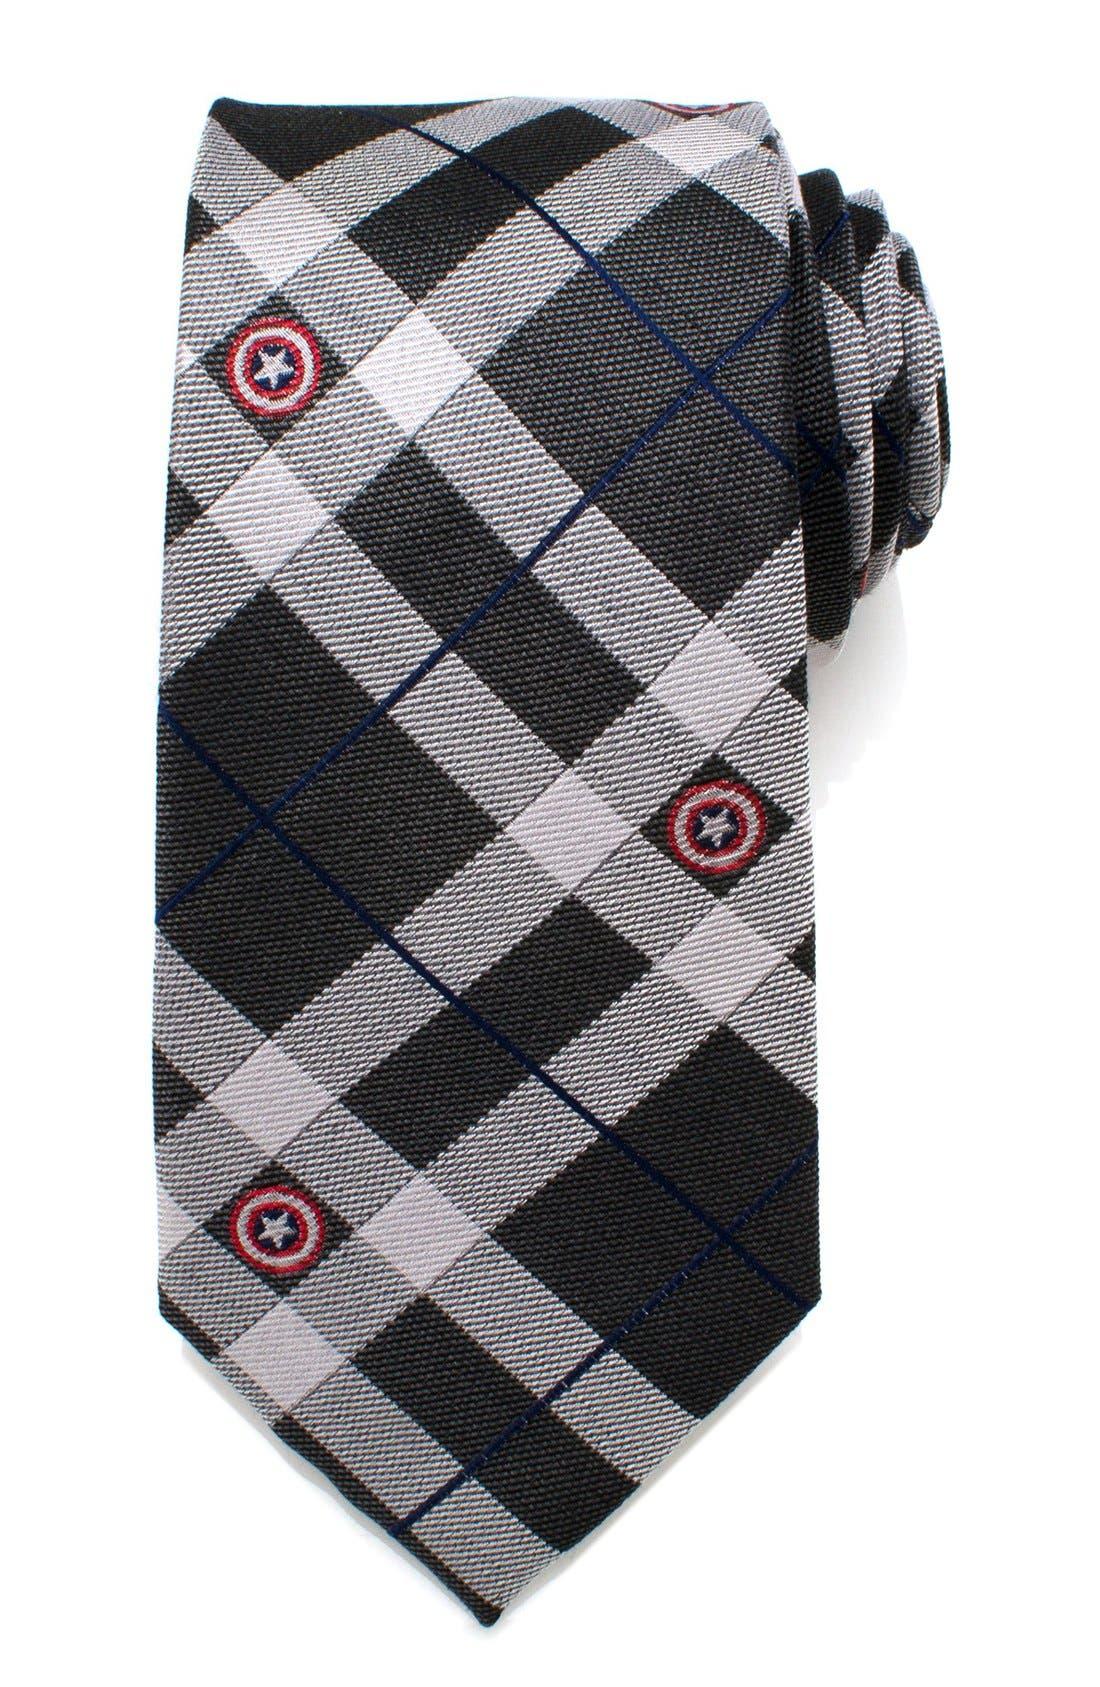 Cufflinks, Inc. 'Captain America' Silk Tie